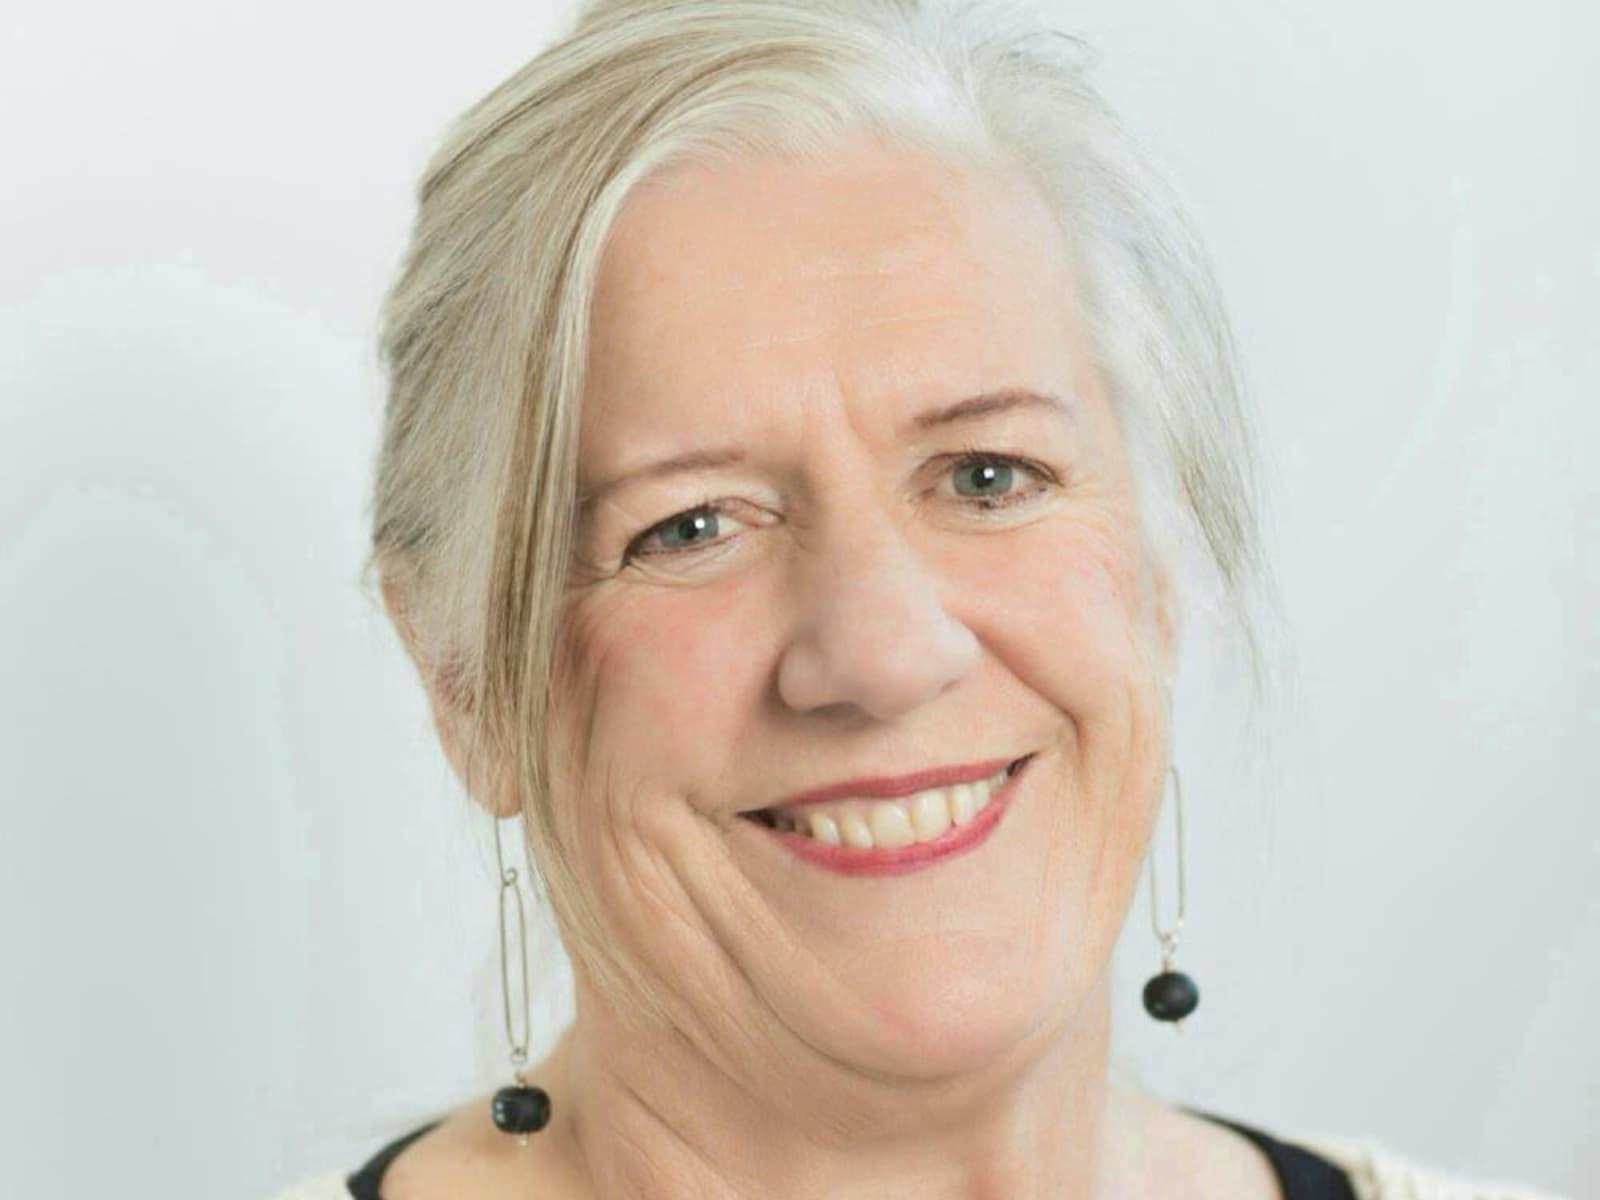 Catherine from Hobart, Tasmania, Australia